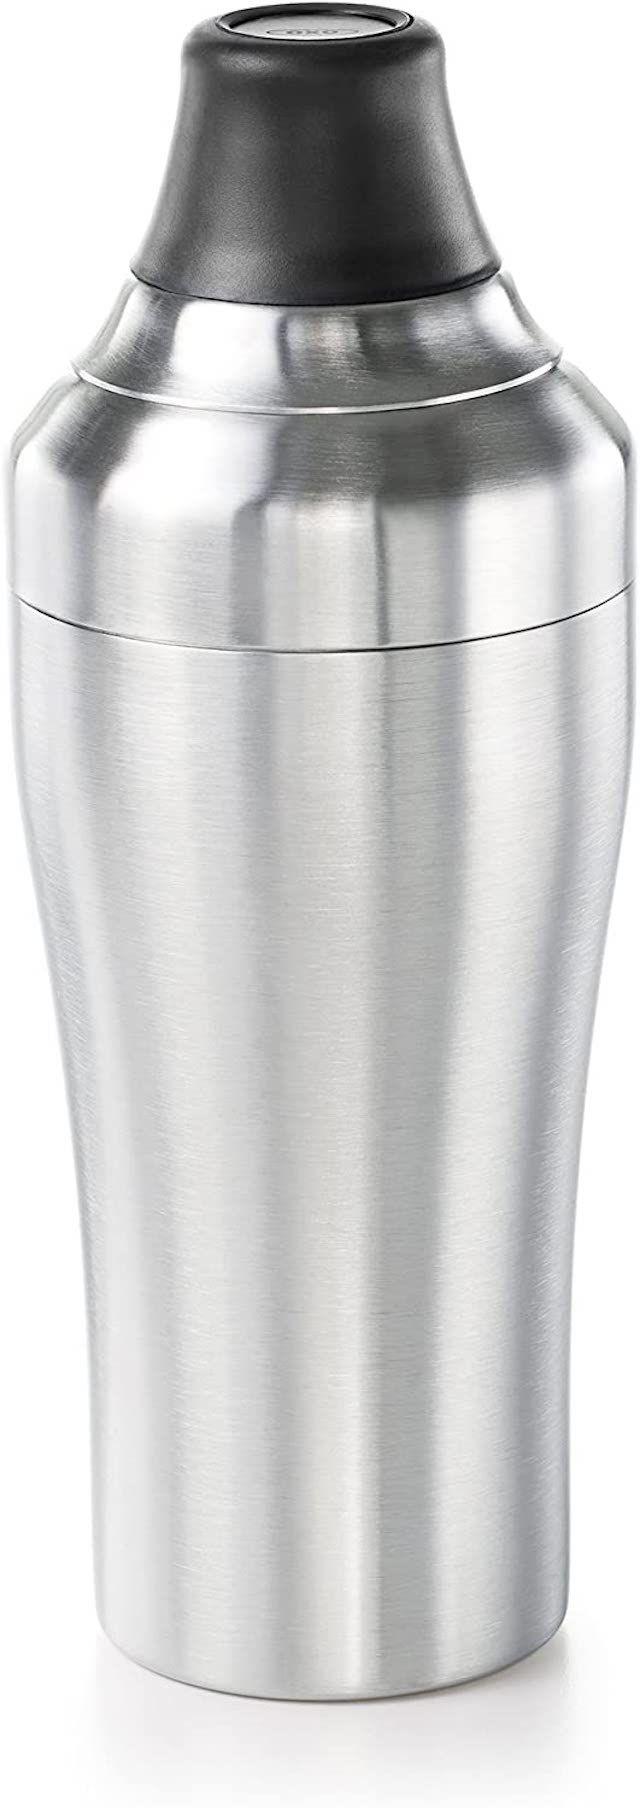 OXO-Steel-Cocktail-Shaker